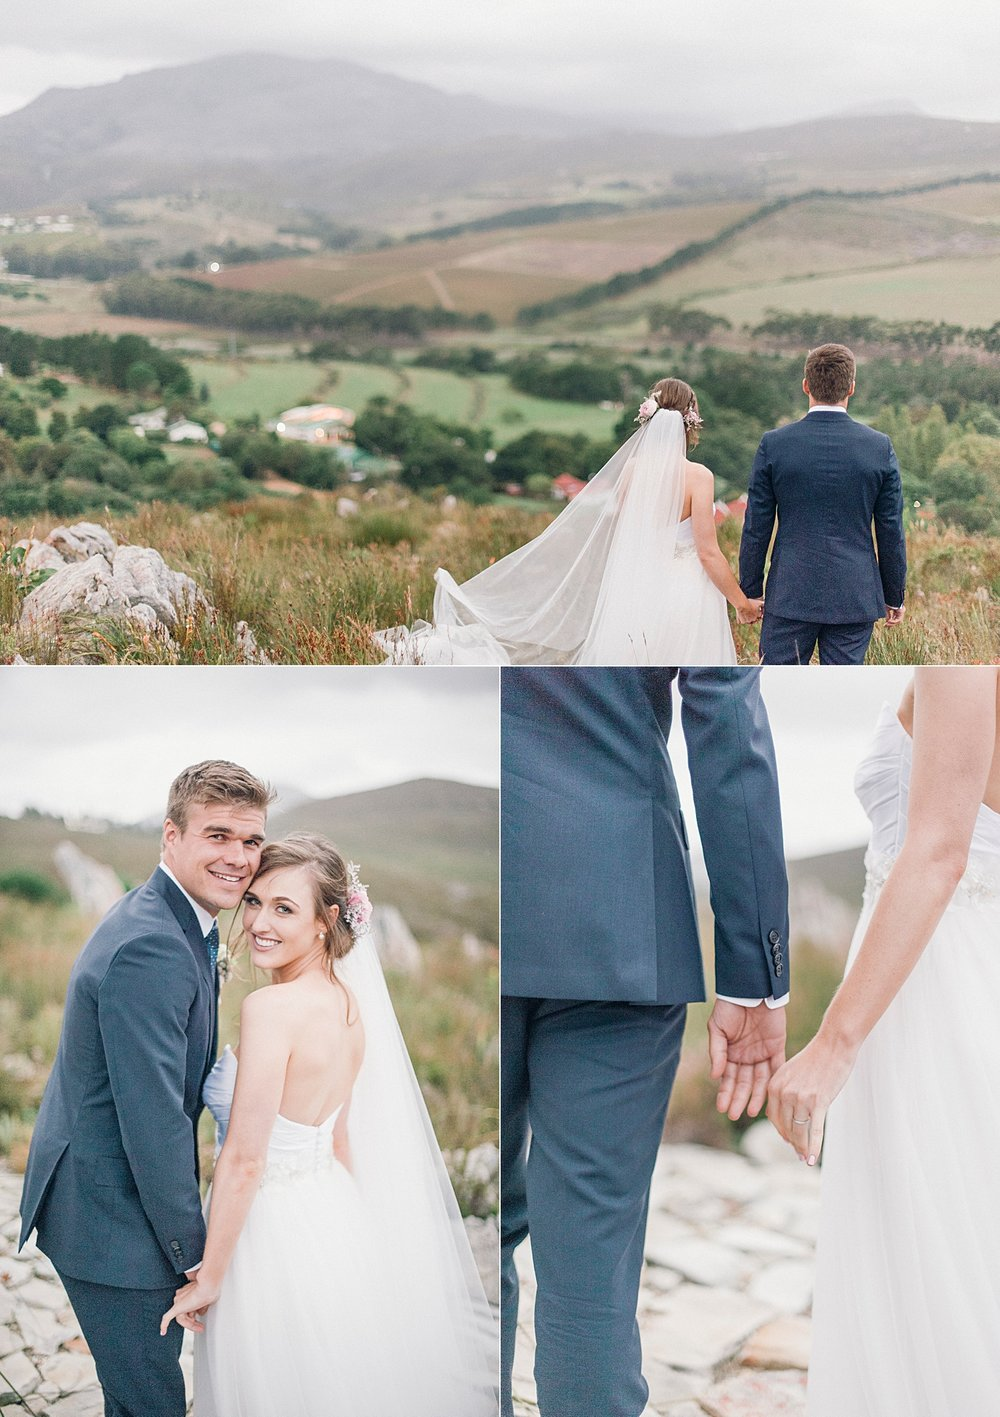 RyanParker_WeddingPhotographer_CapeTown_BonaDea_Hermanus_S&A_DSC_2042.jpg